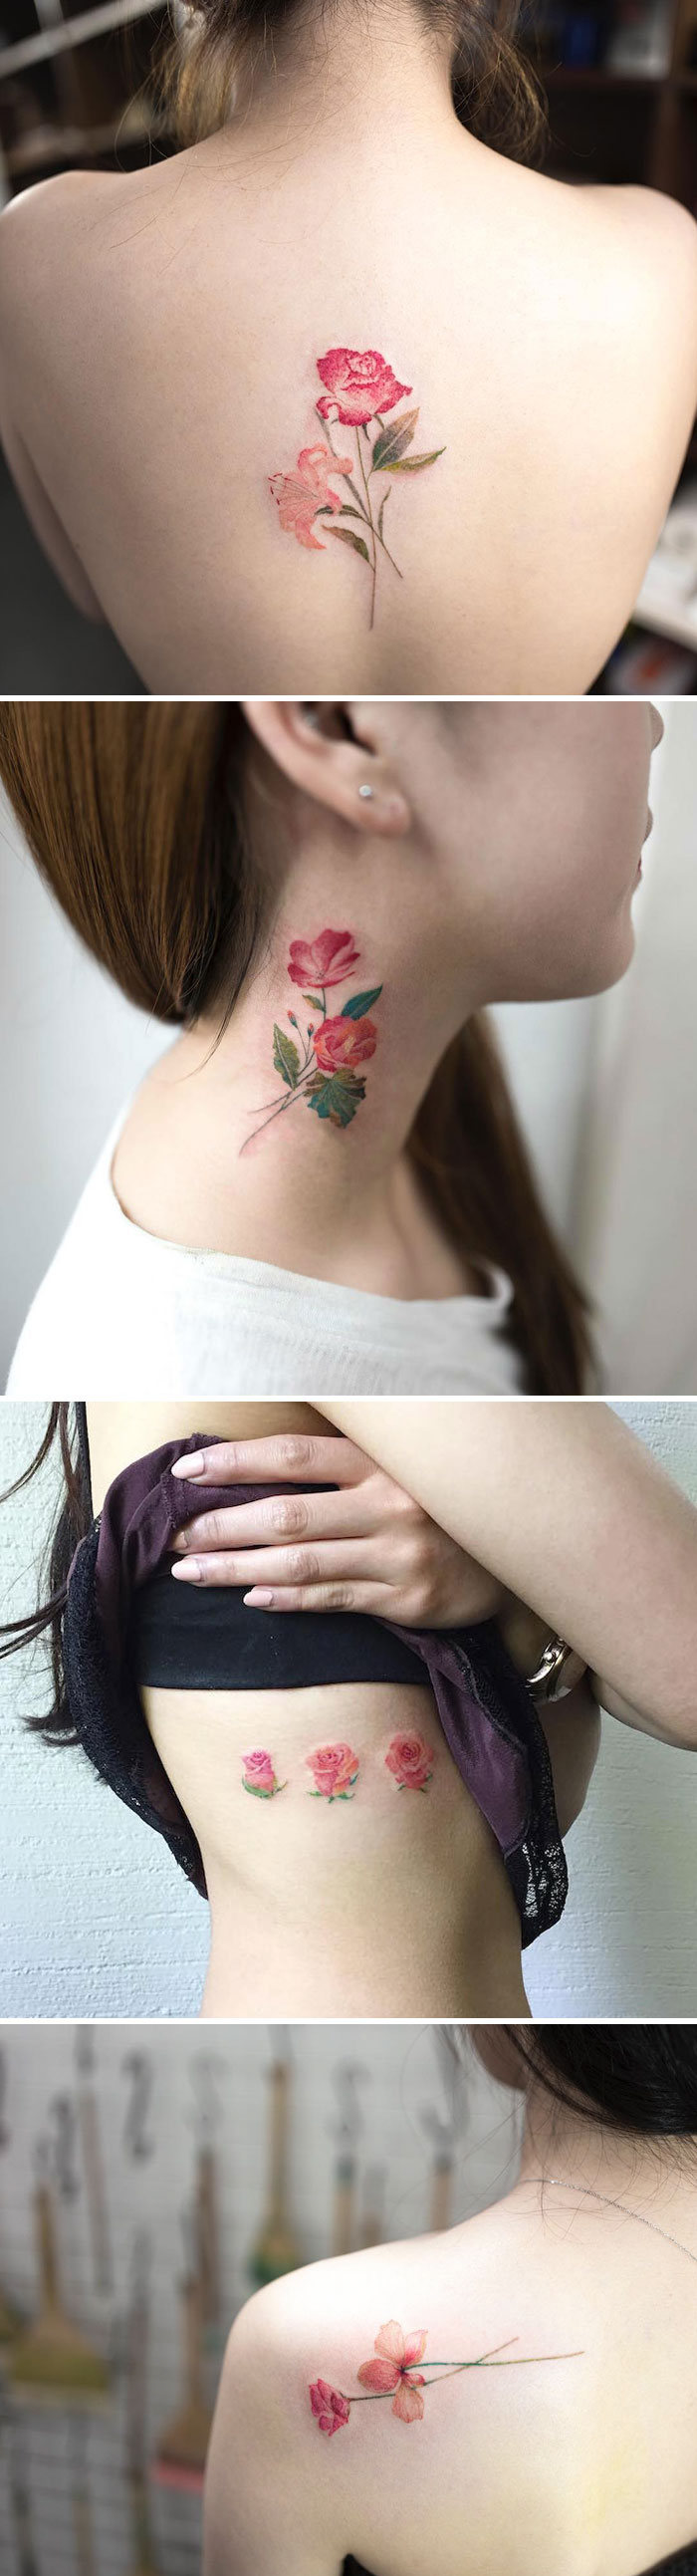 floral-tattoo-artists-13-58e254cd7e1b9__700